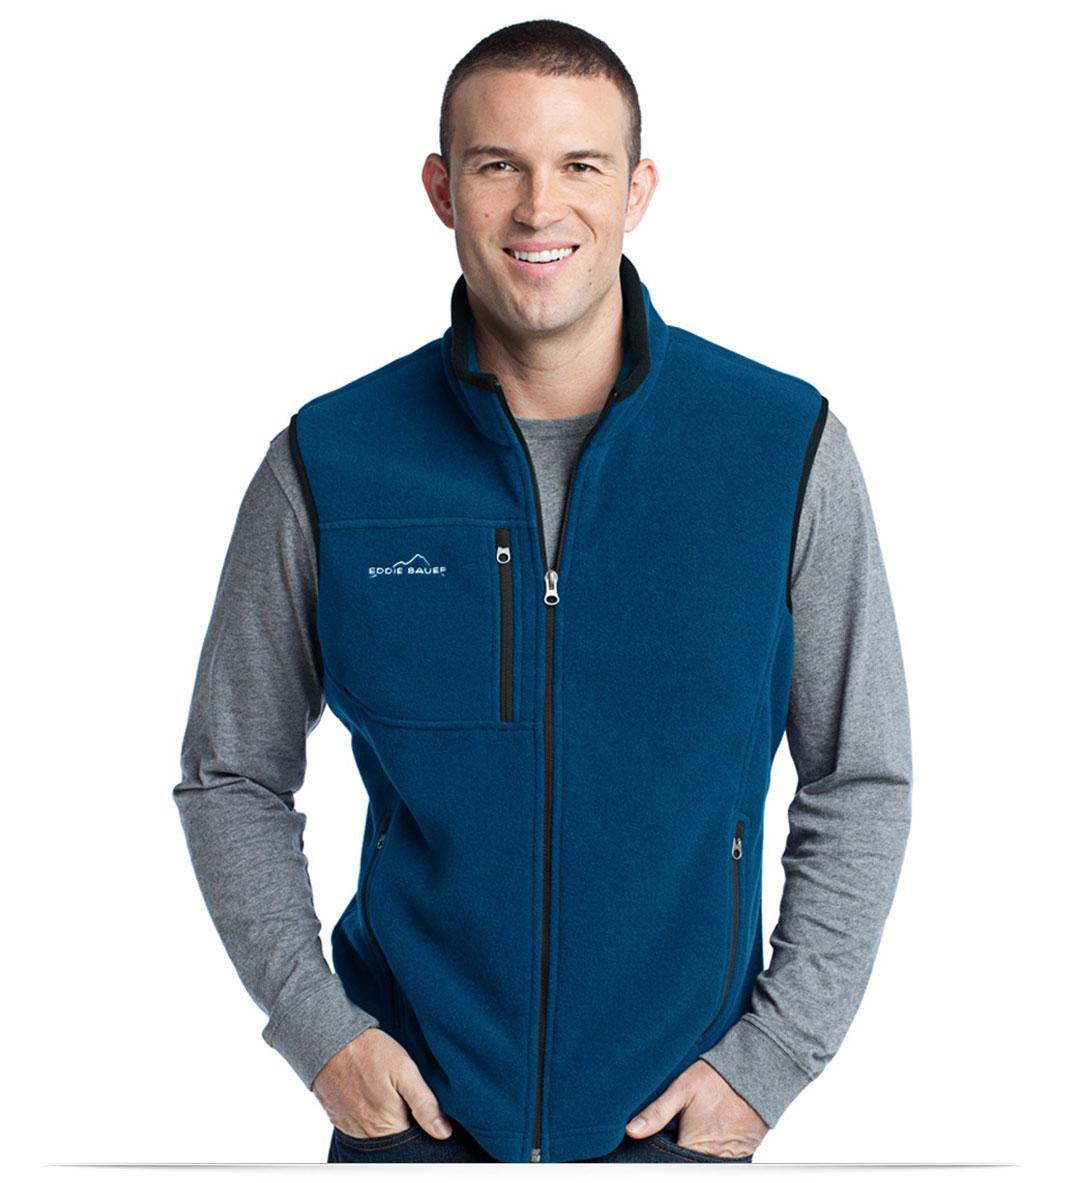 Personalize Embroidered Logo on Eddie Bauer Fleece Vest